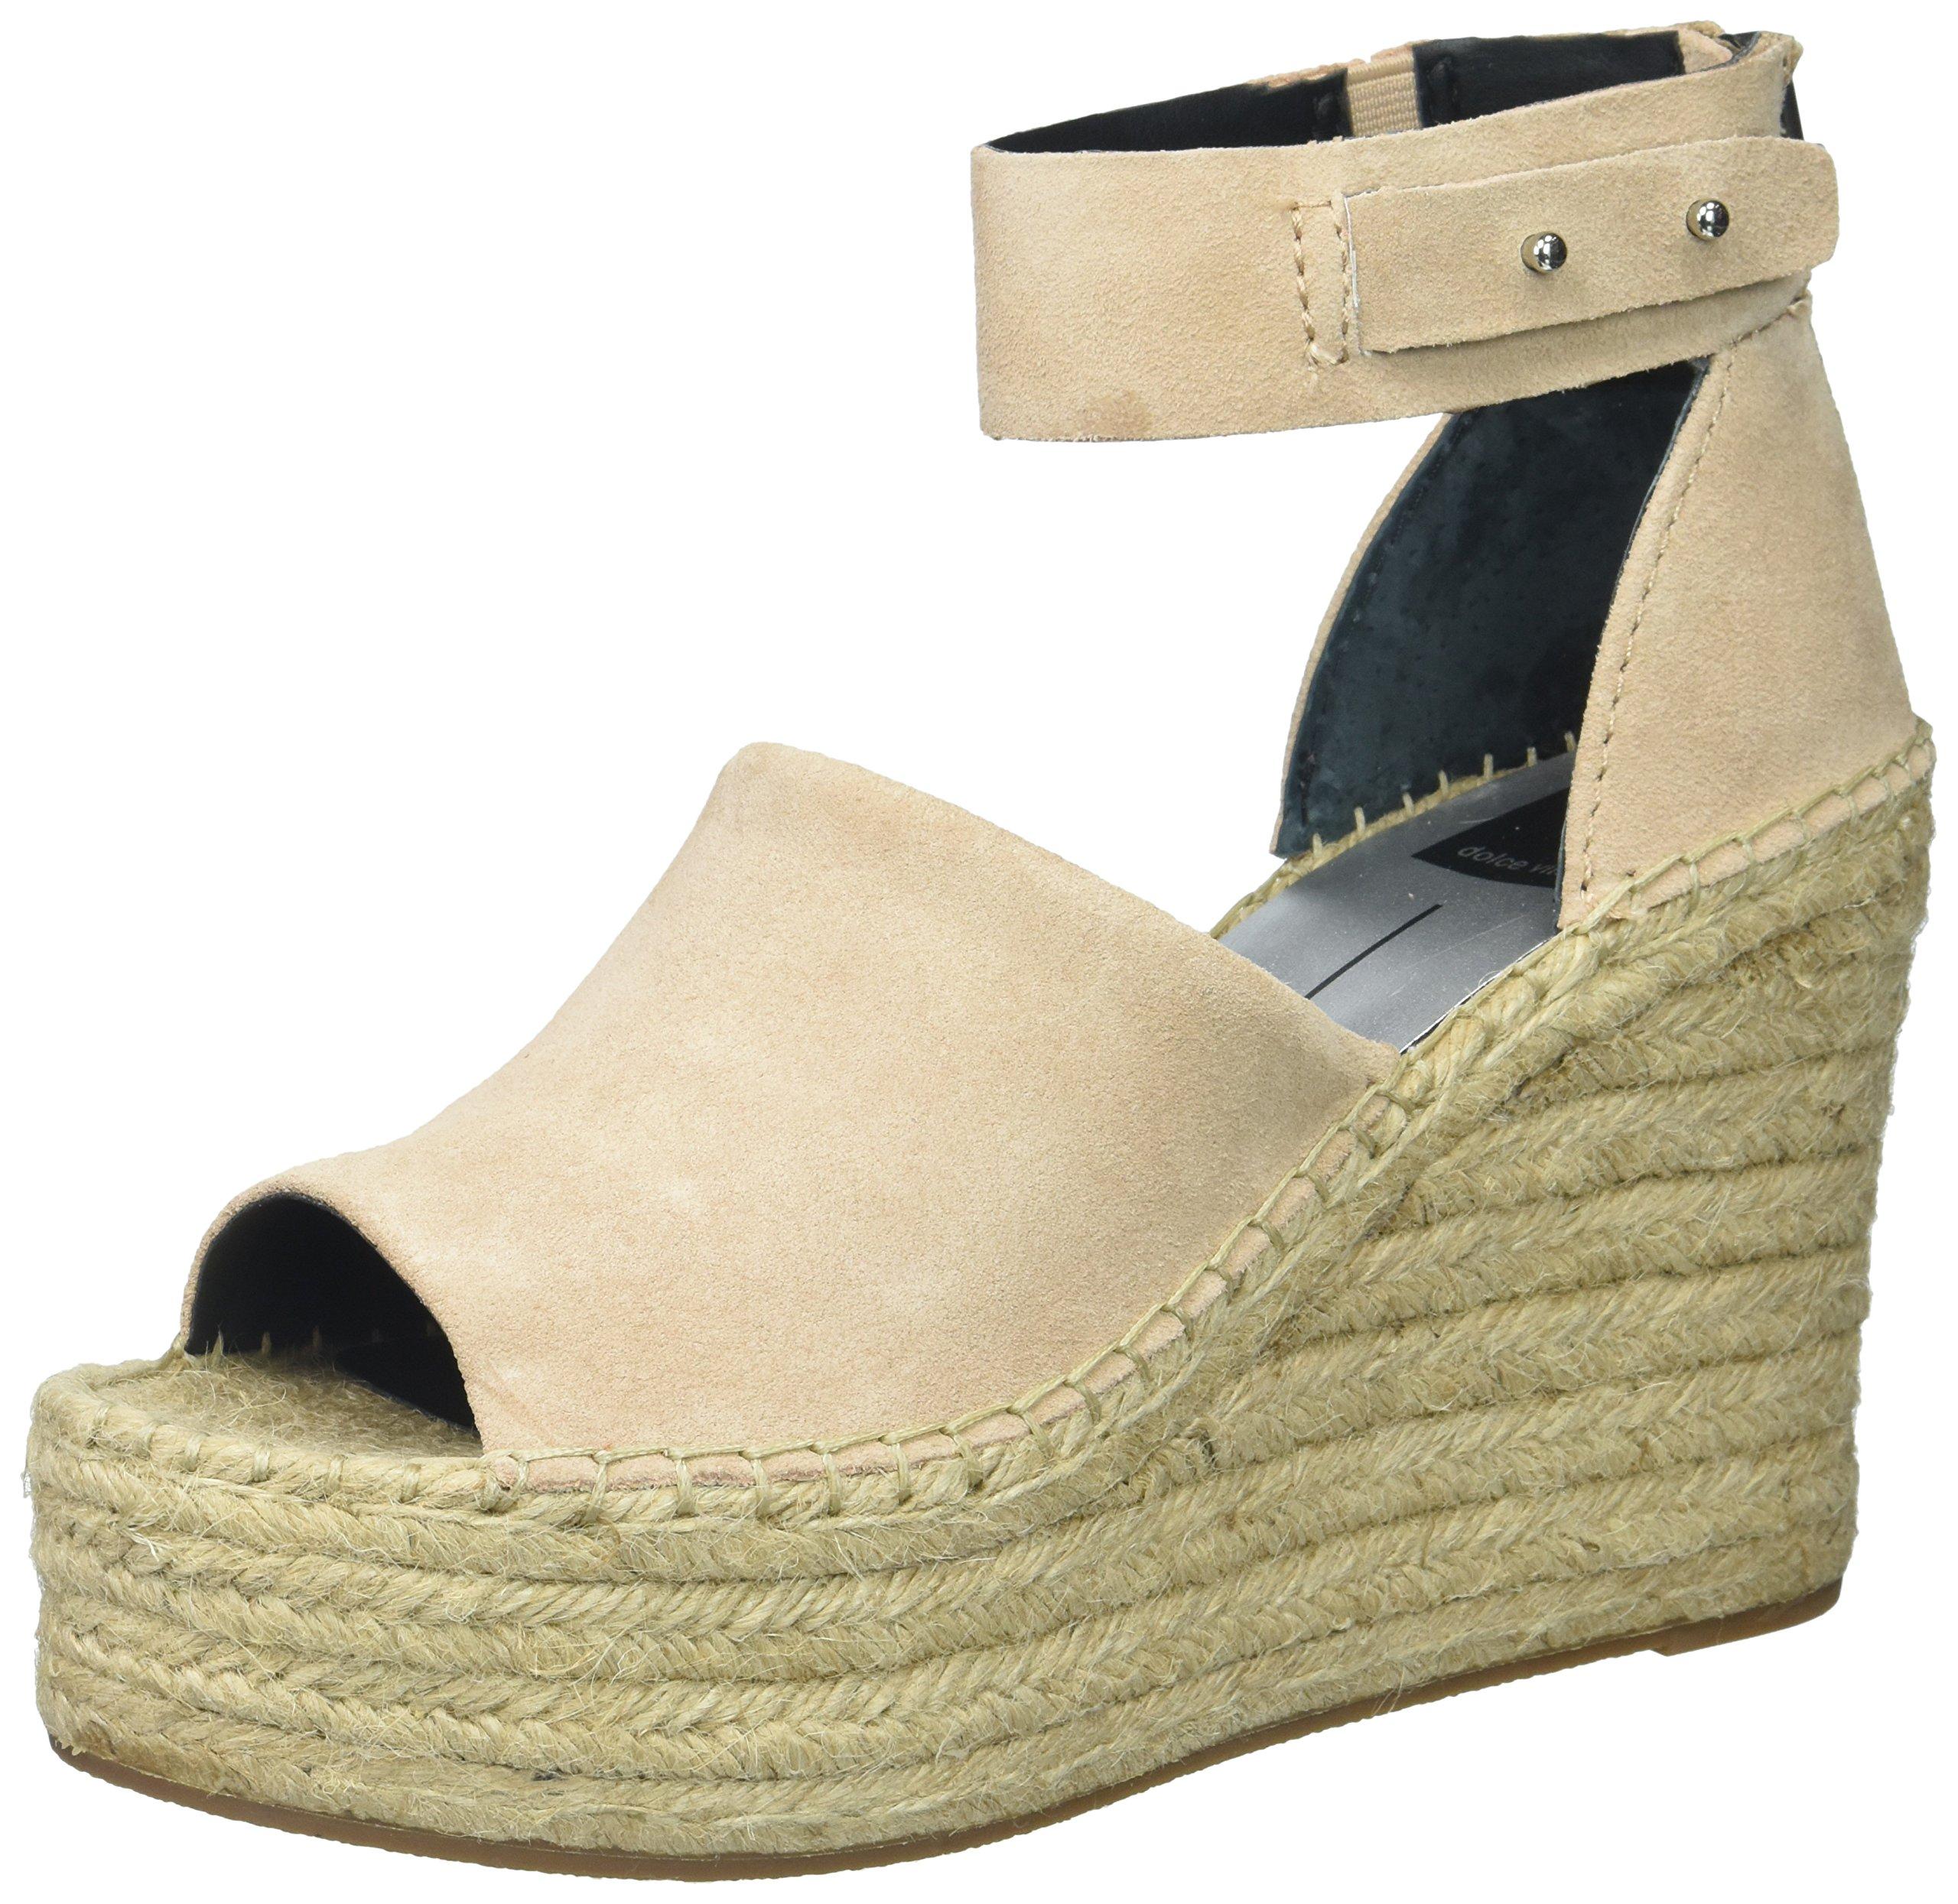 Dolce Vita Women's Straw Wedge Sandal, Blush Suede, 8.5 Medium US